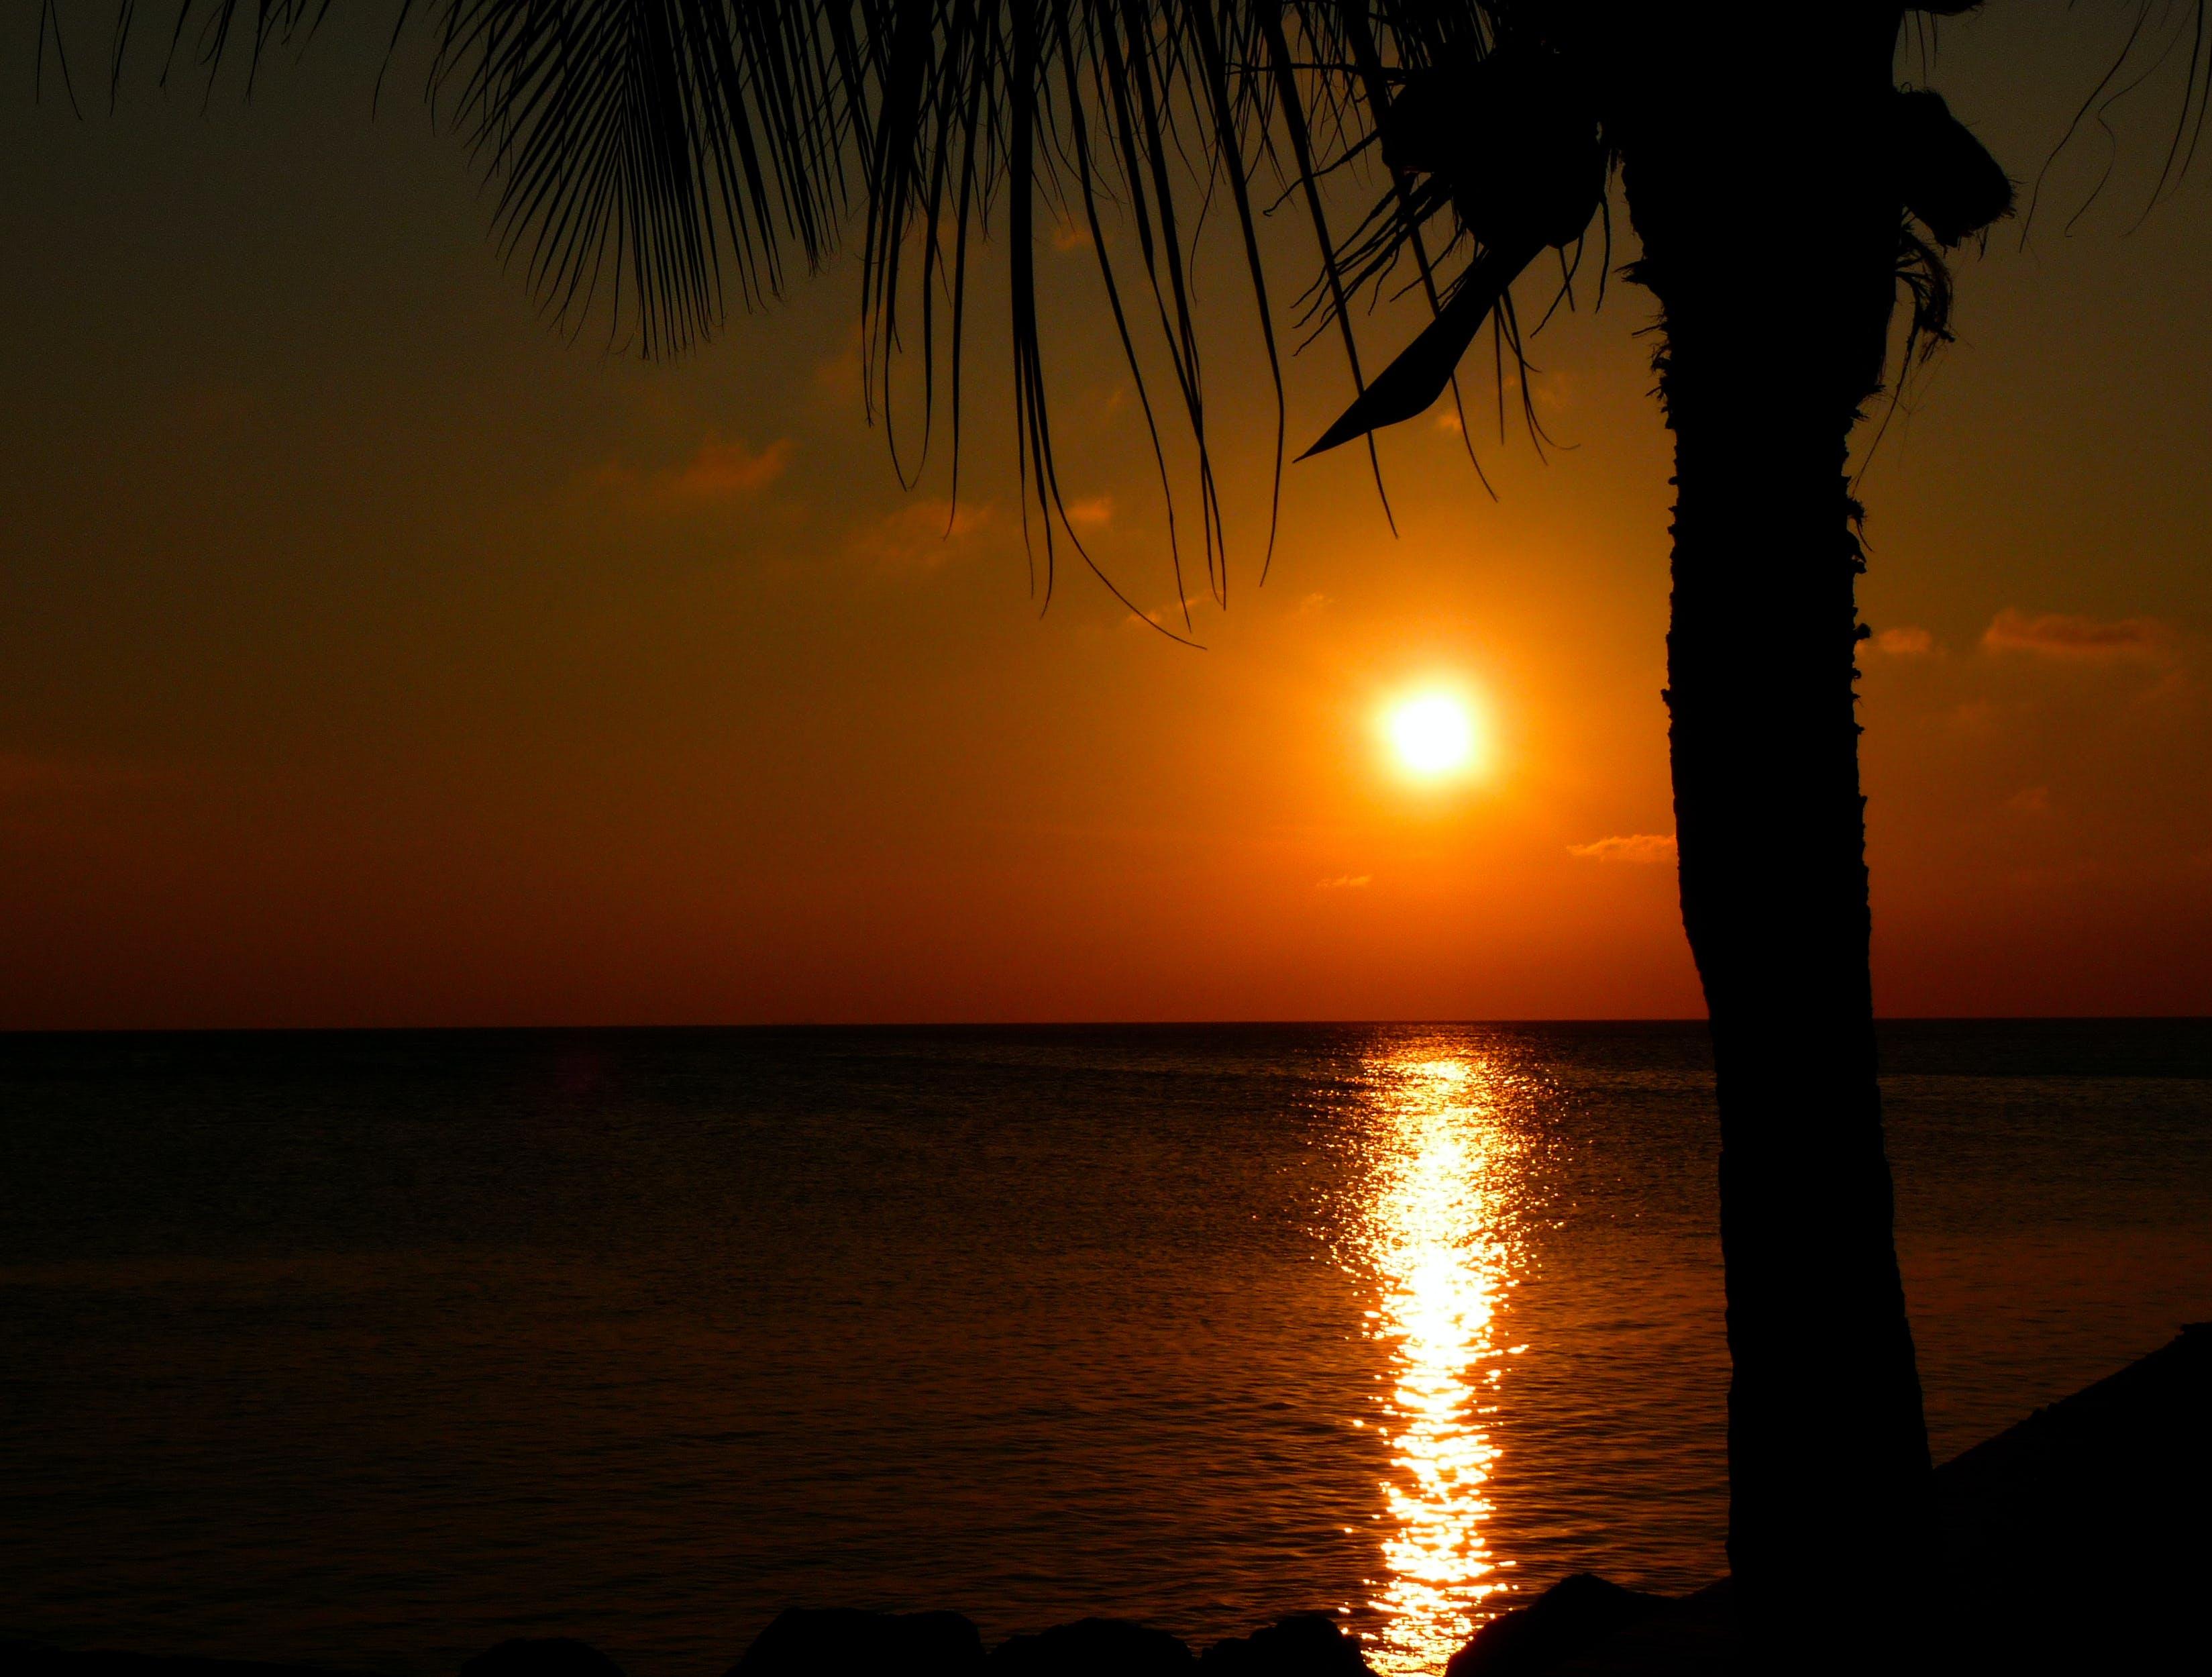 caribbean, dawn, dusk